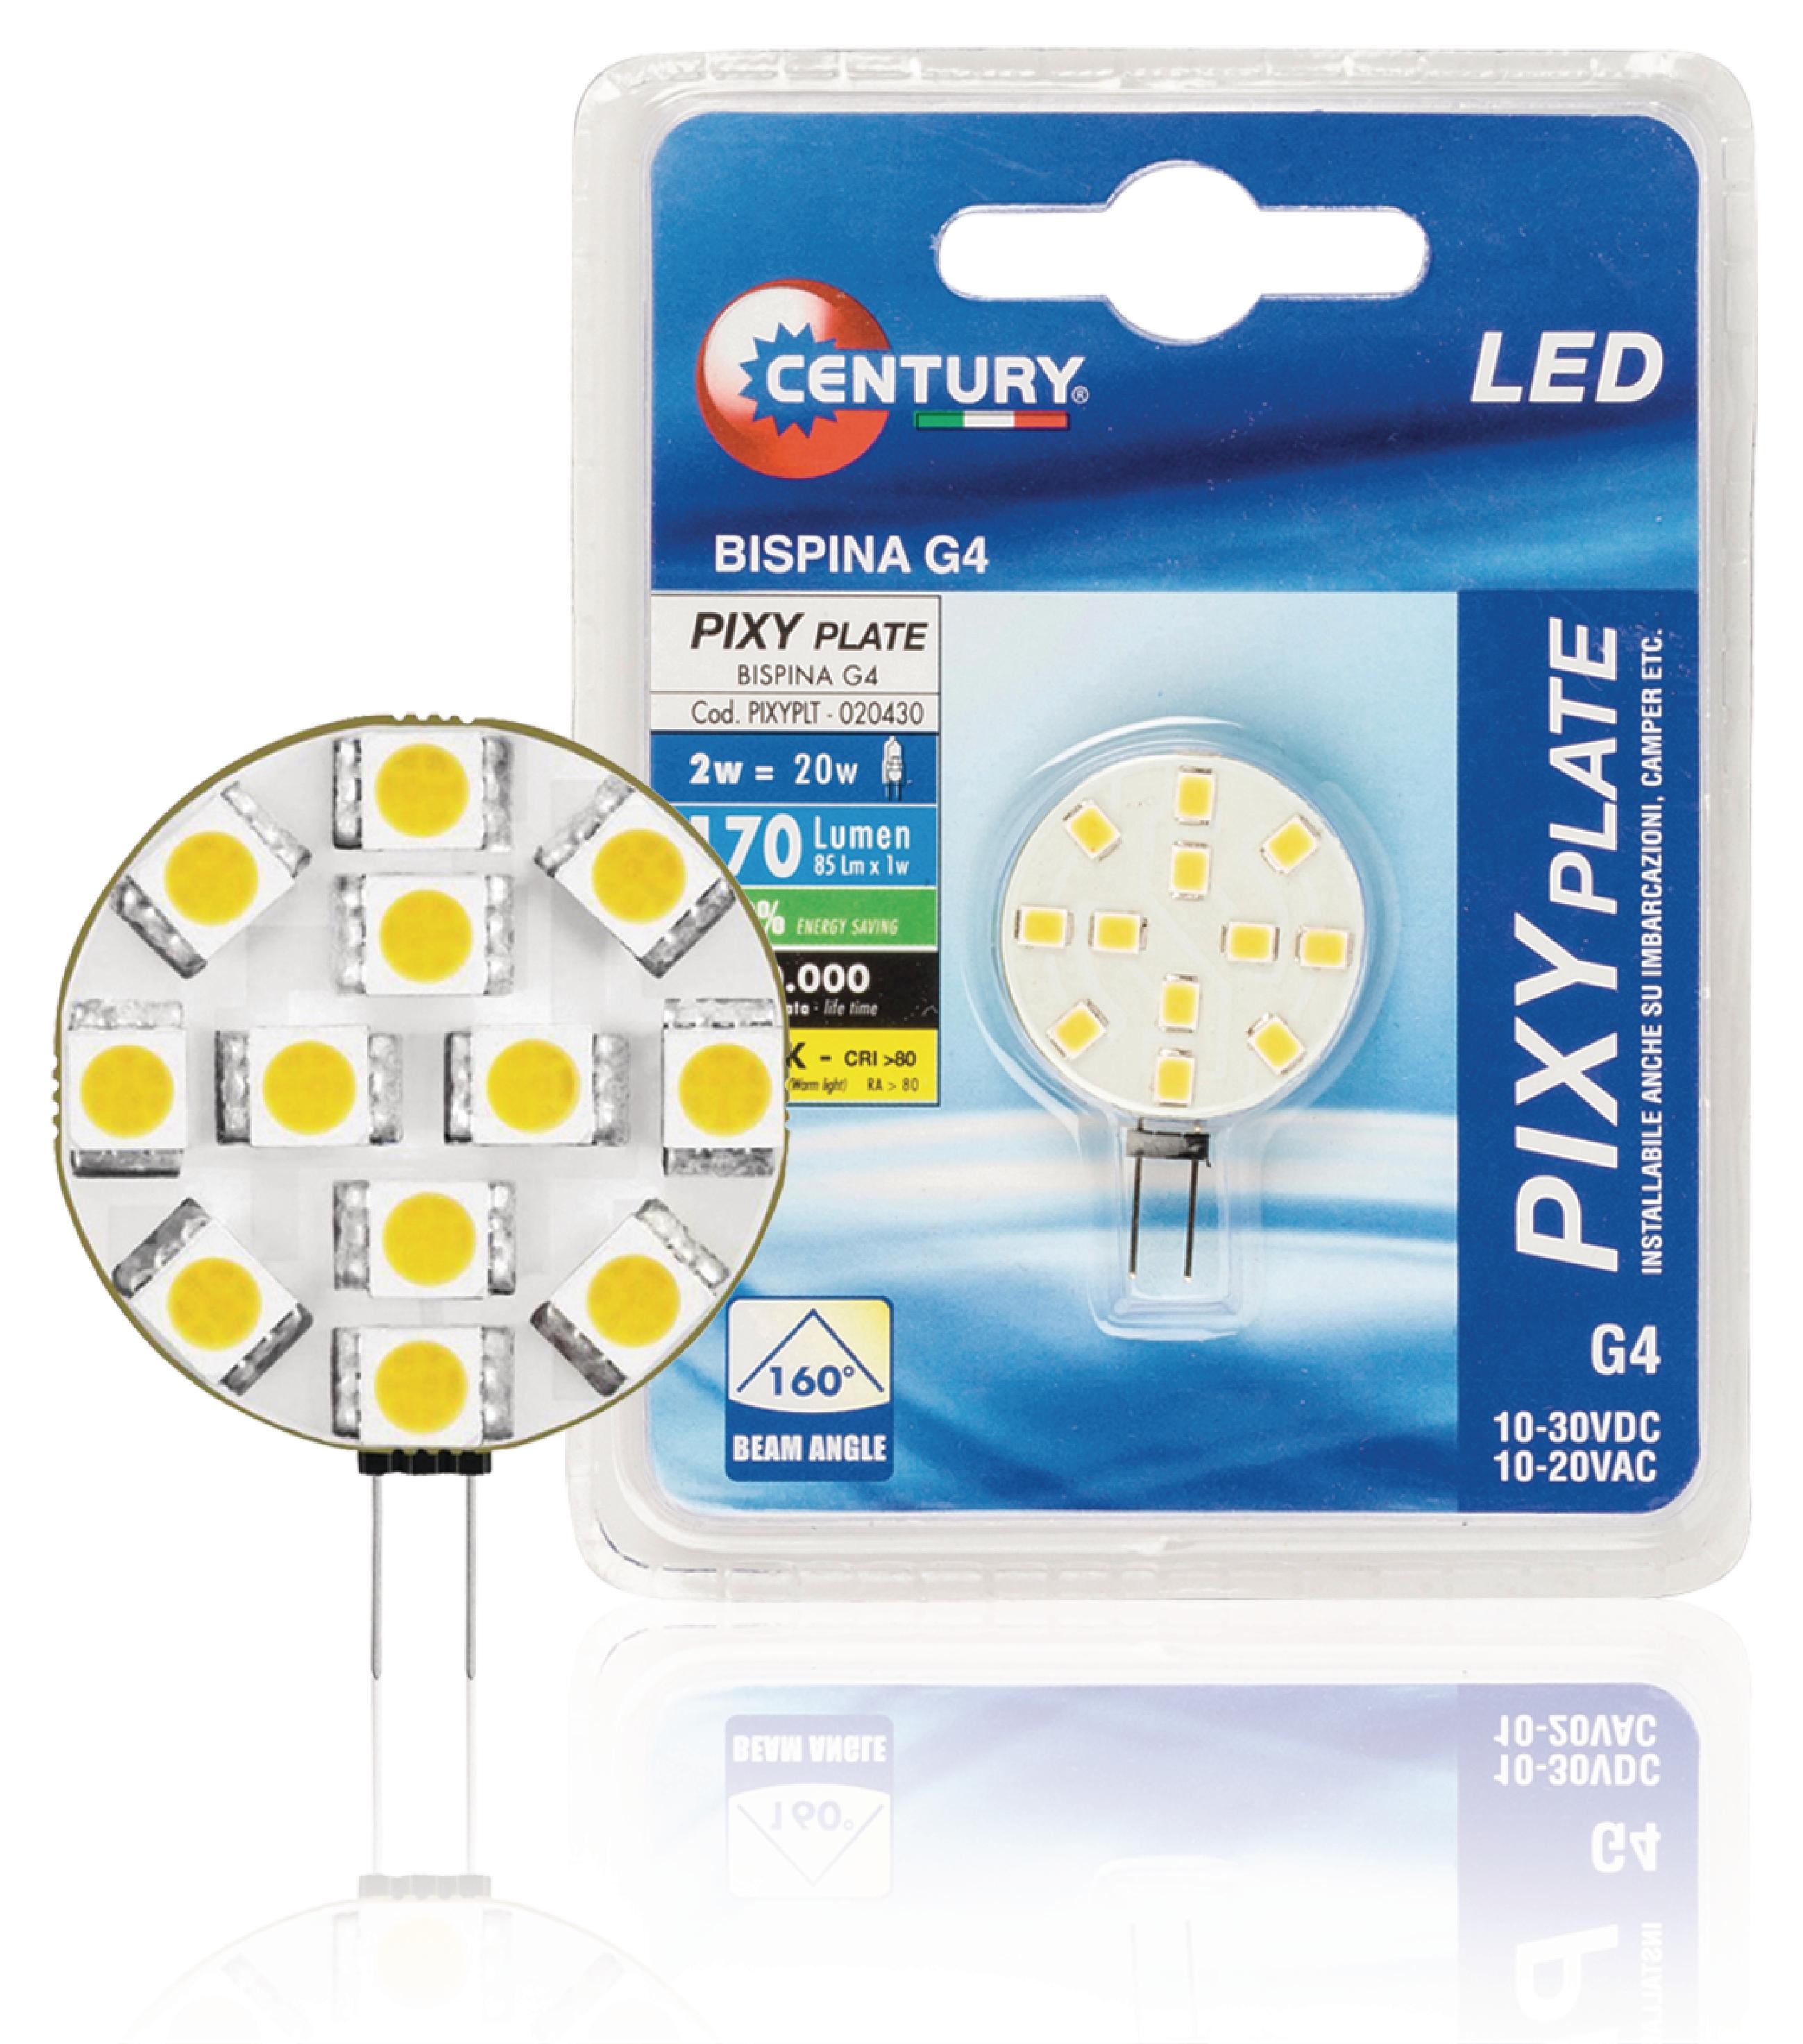 LED-Lampe G4 Kapsel 2 W 170 lm 3000 K